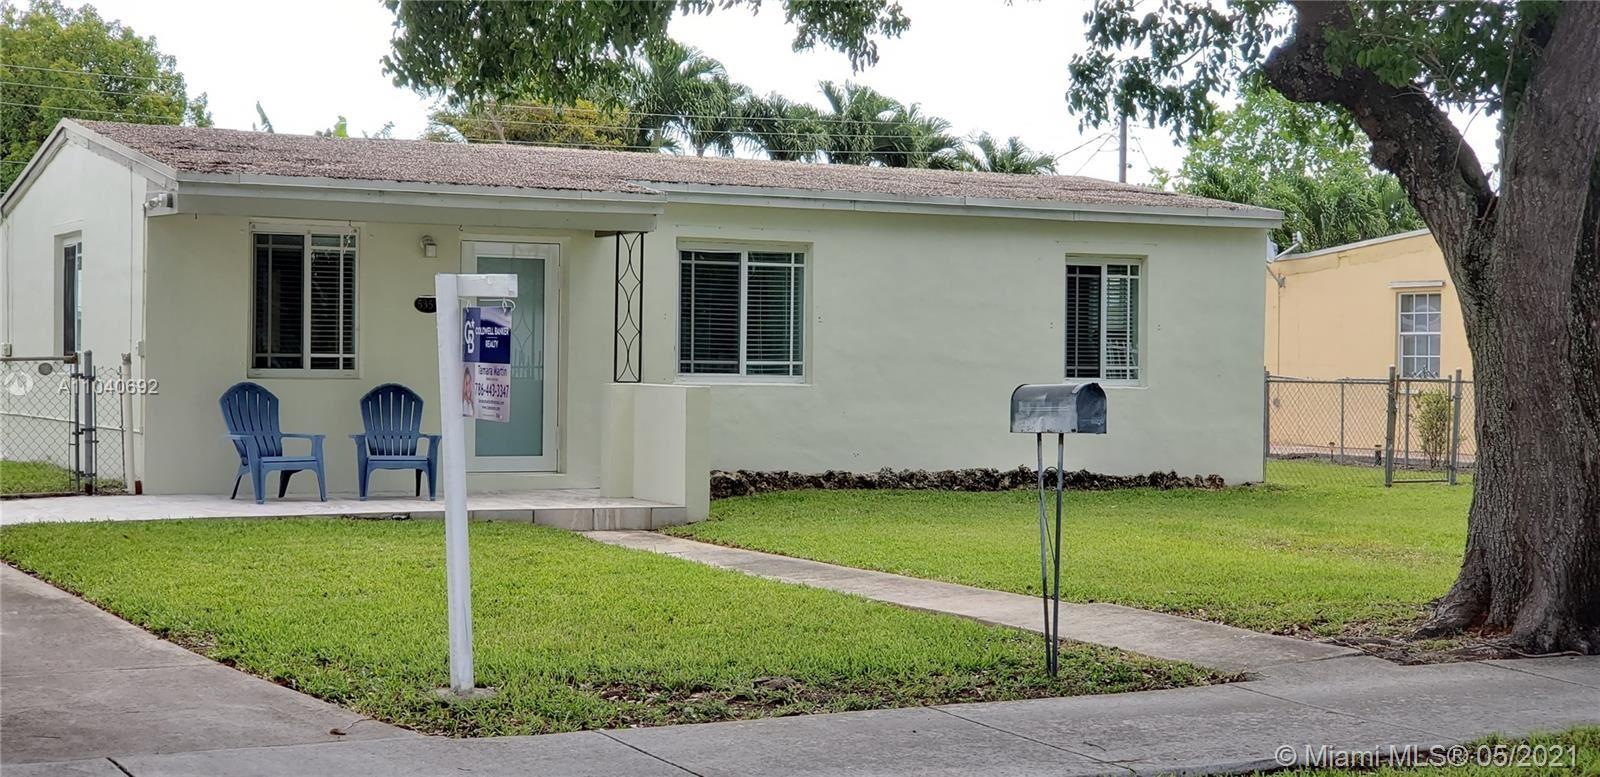 Photo of 5355 SW 99th Ave, Miami, FL 33165 (MLS # A11040692)